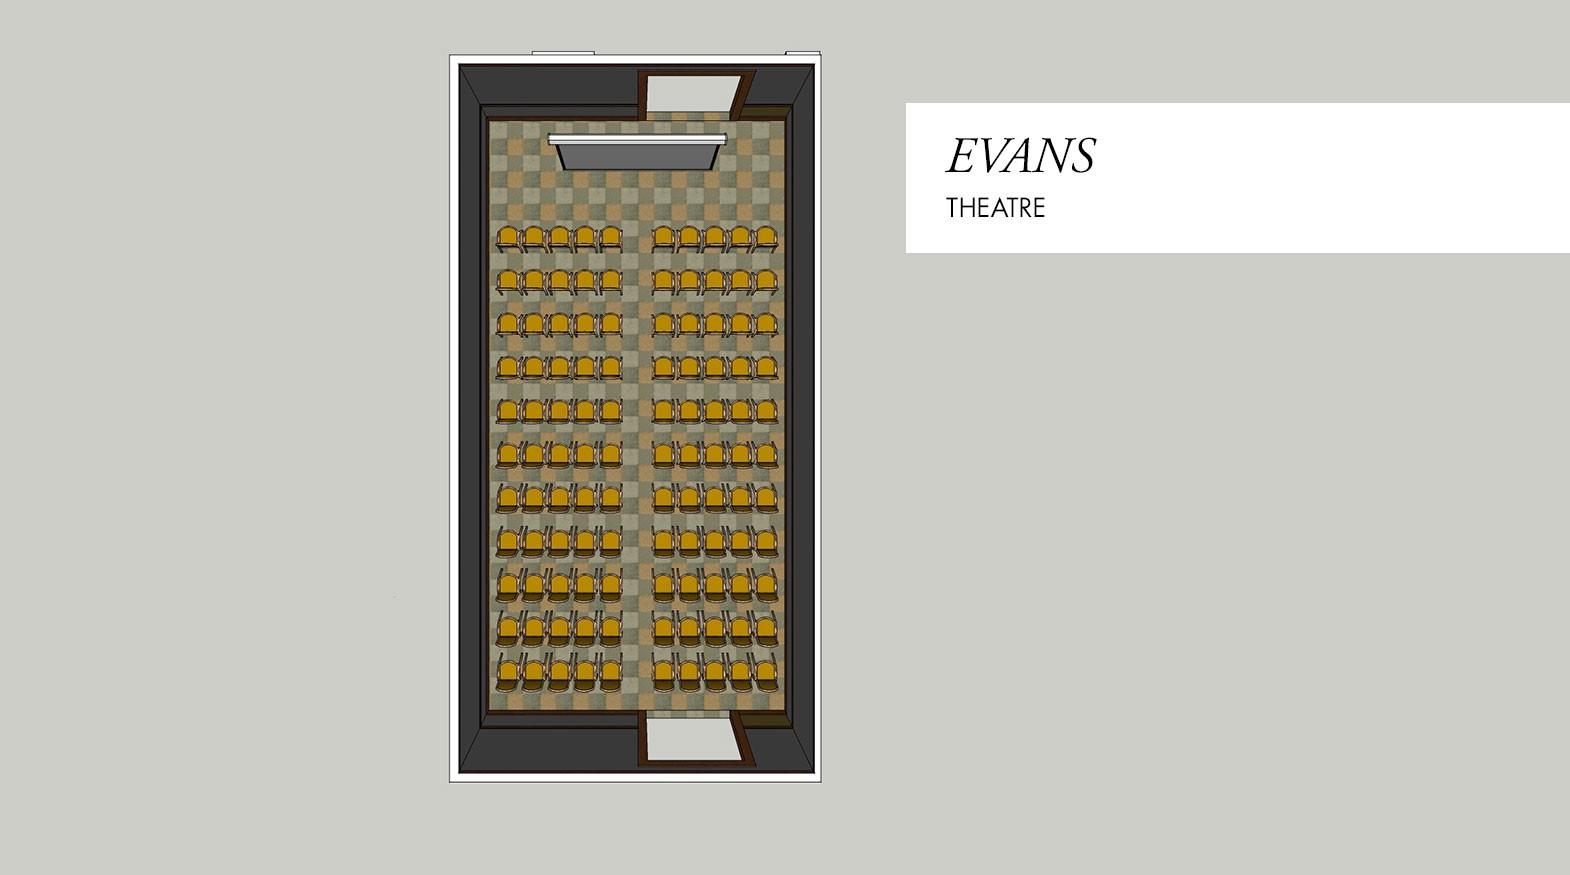 evans-theatre.jpg